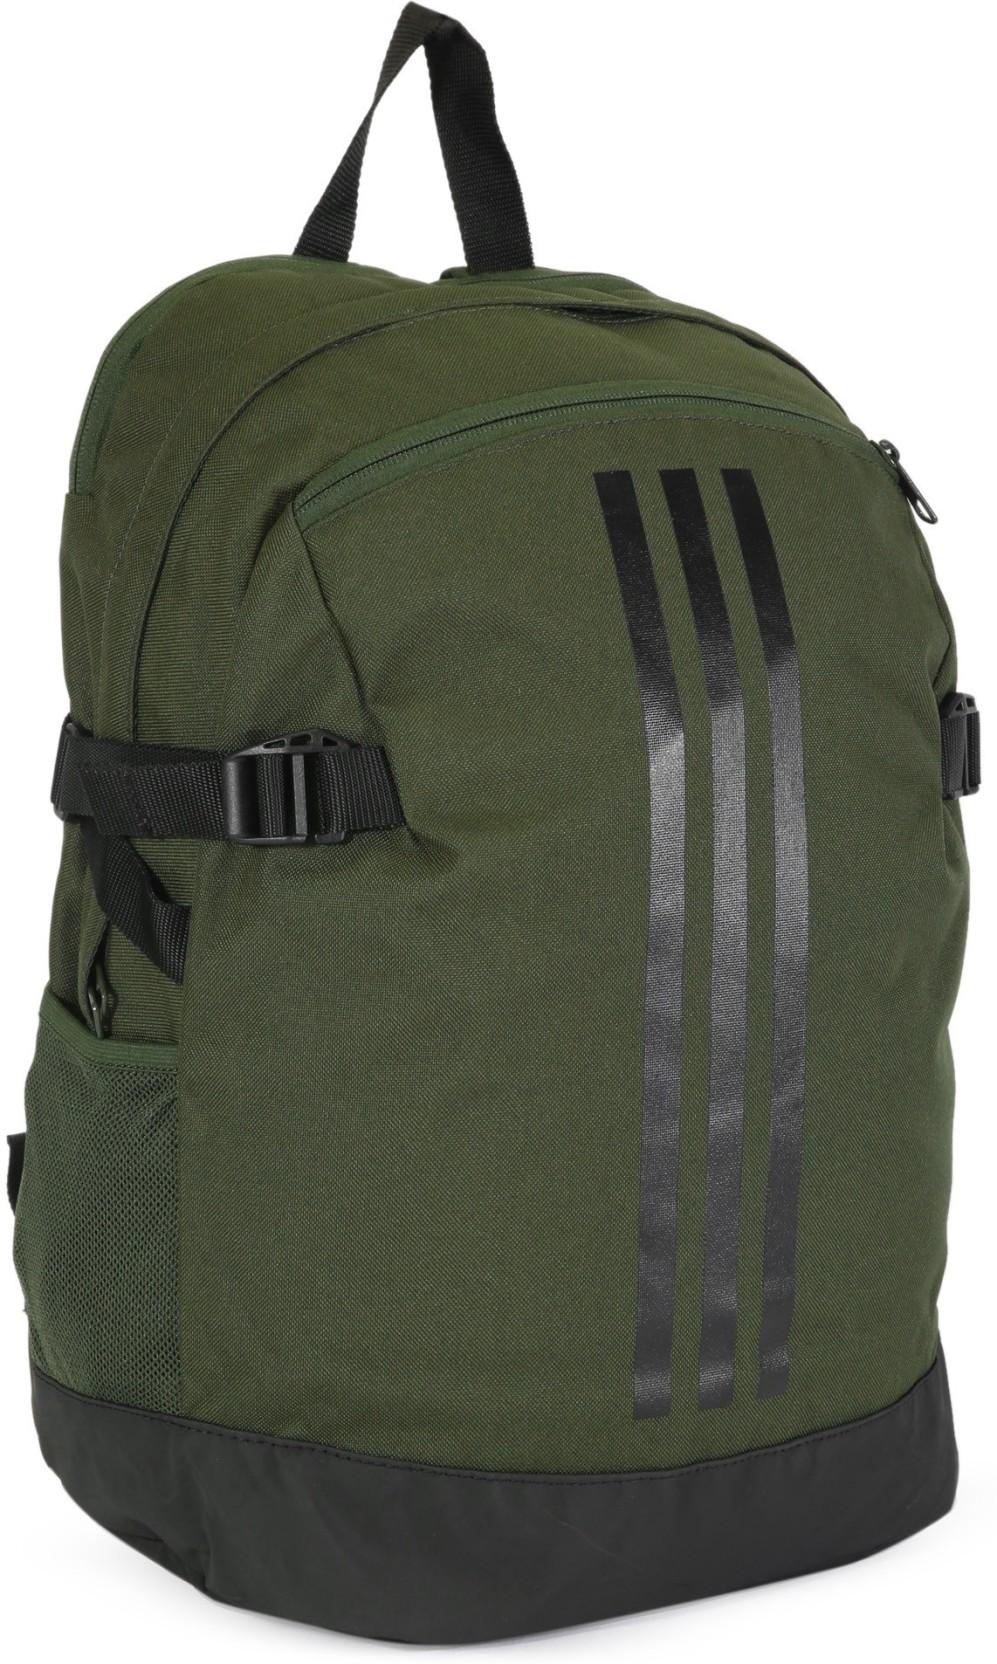 wholesale dealer 0035e 057a6 ADIDAS BP POWER IV M 27 L Backpack (Green)